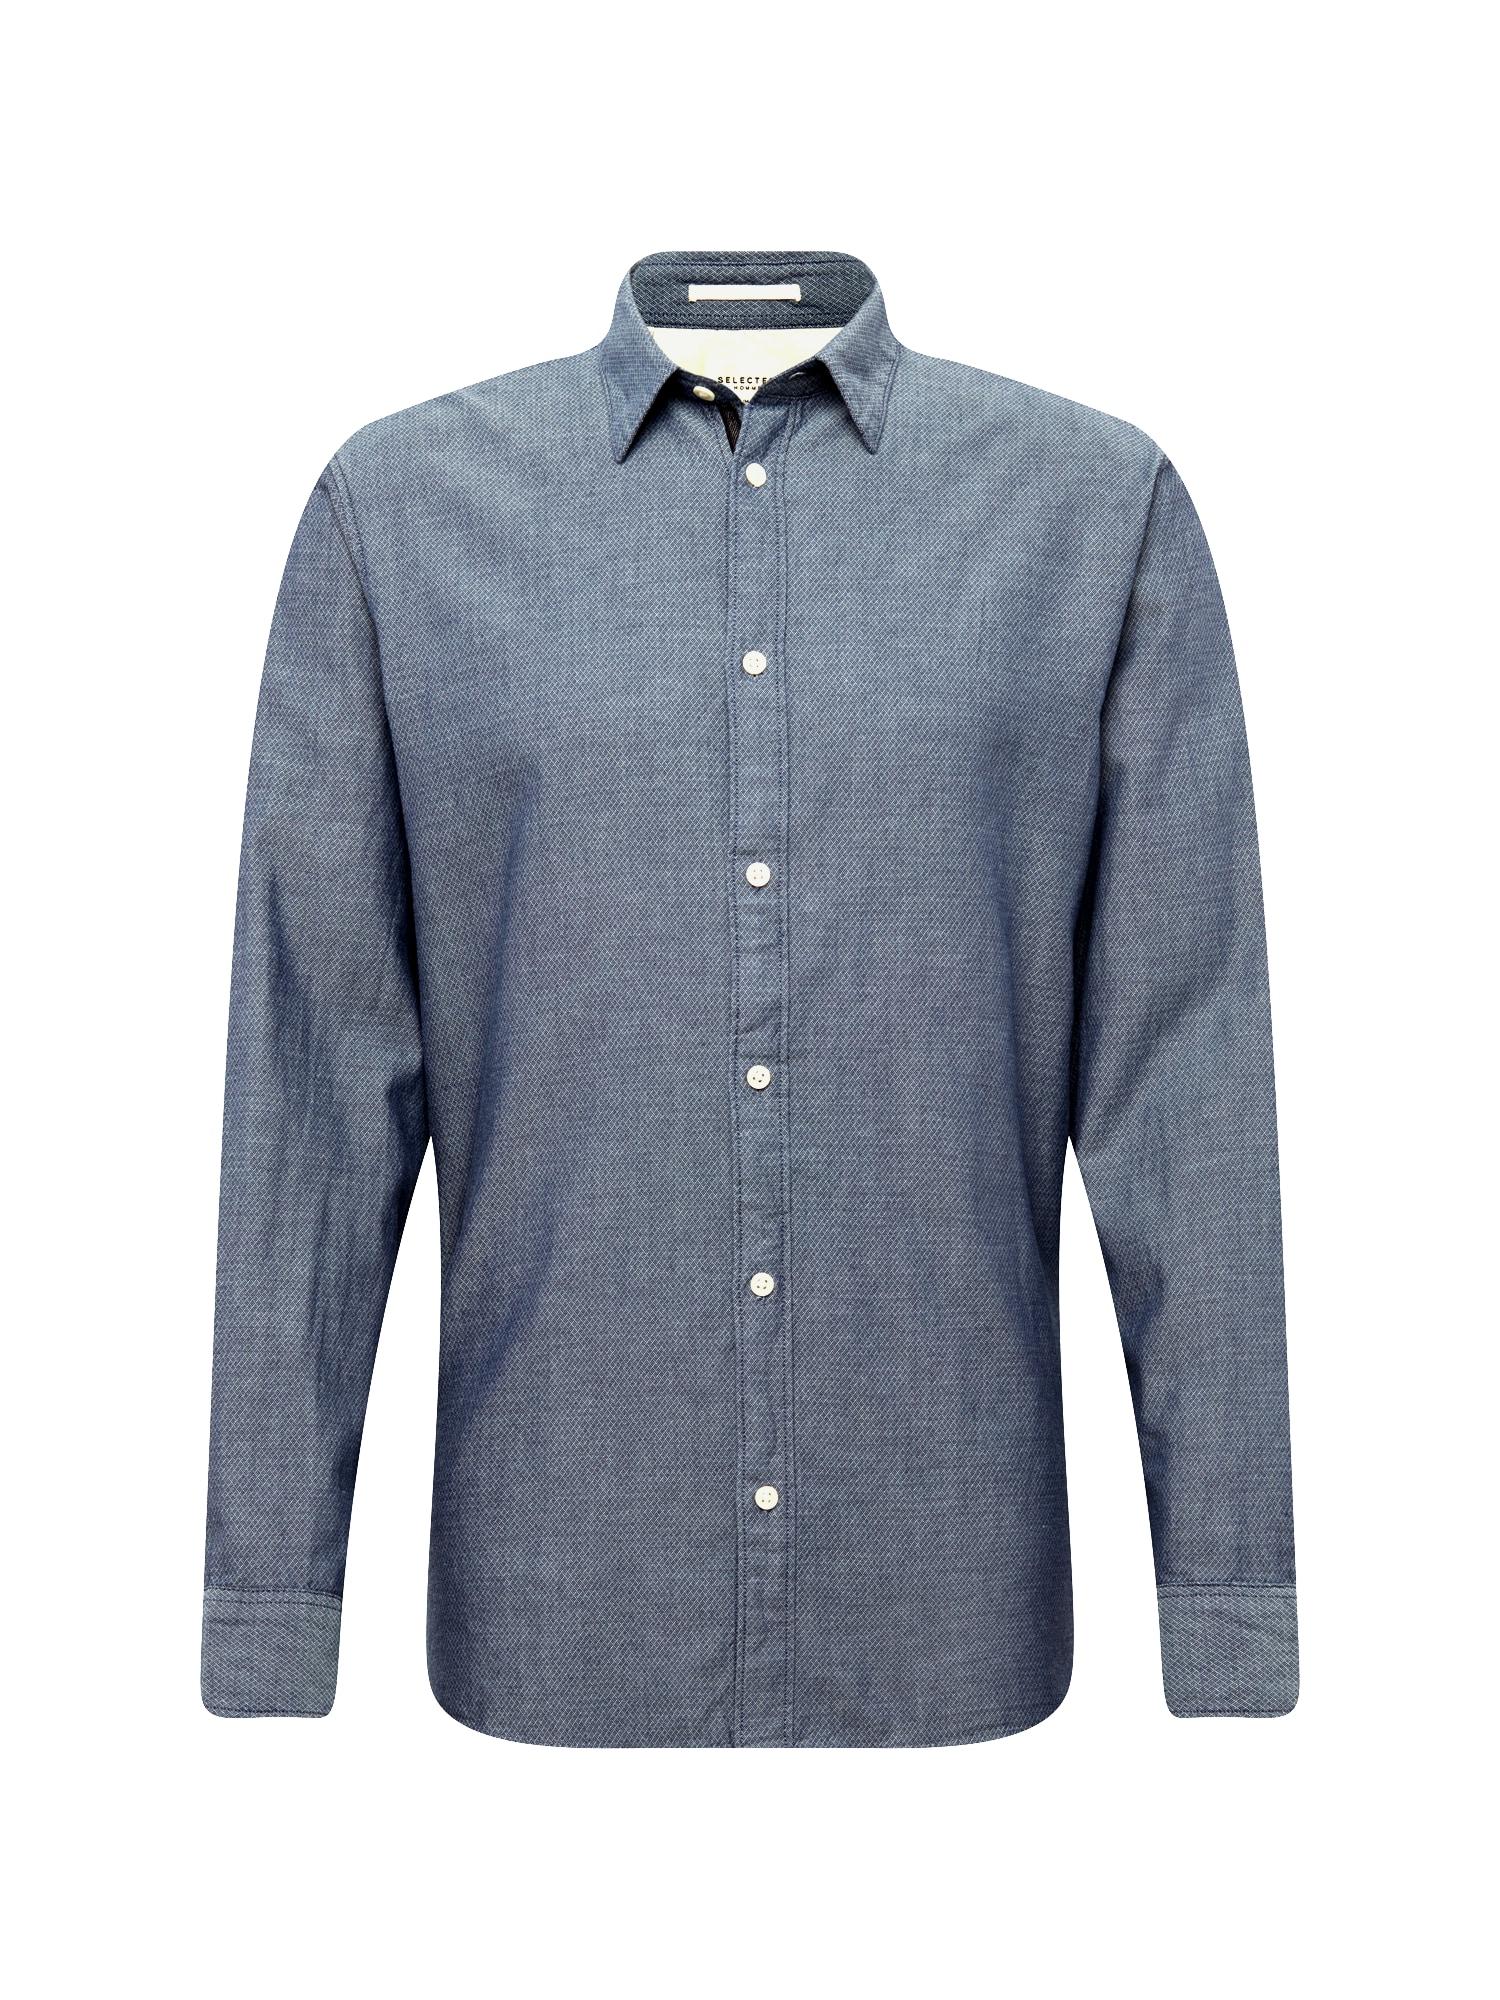 Košile JORDAN tmavě modrá SELECTED HOMME